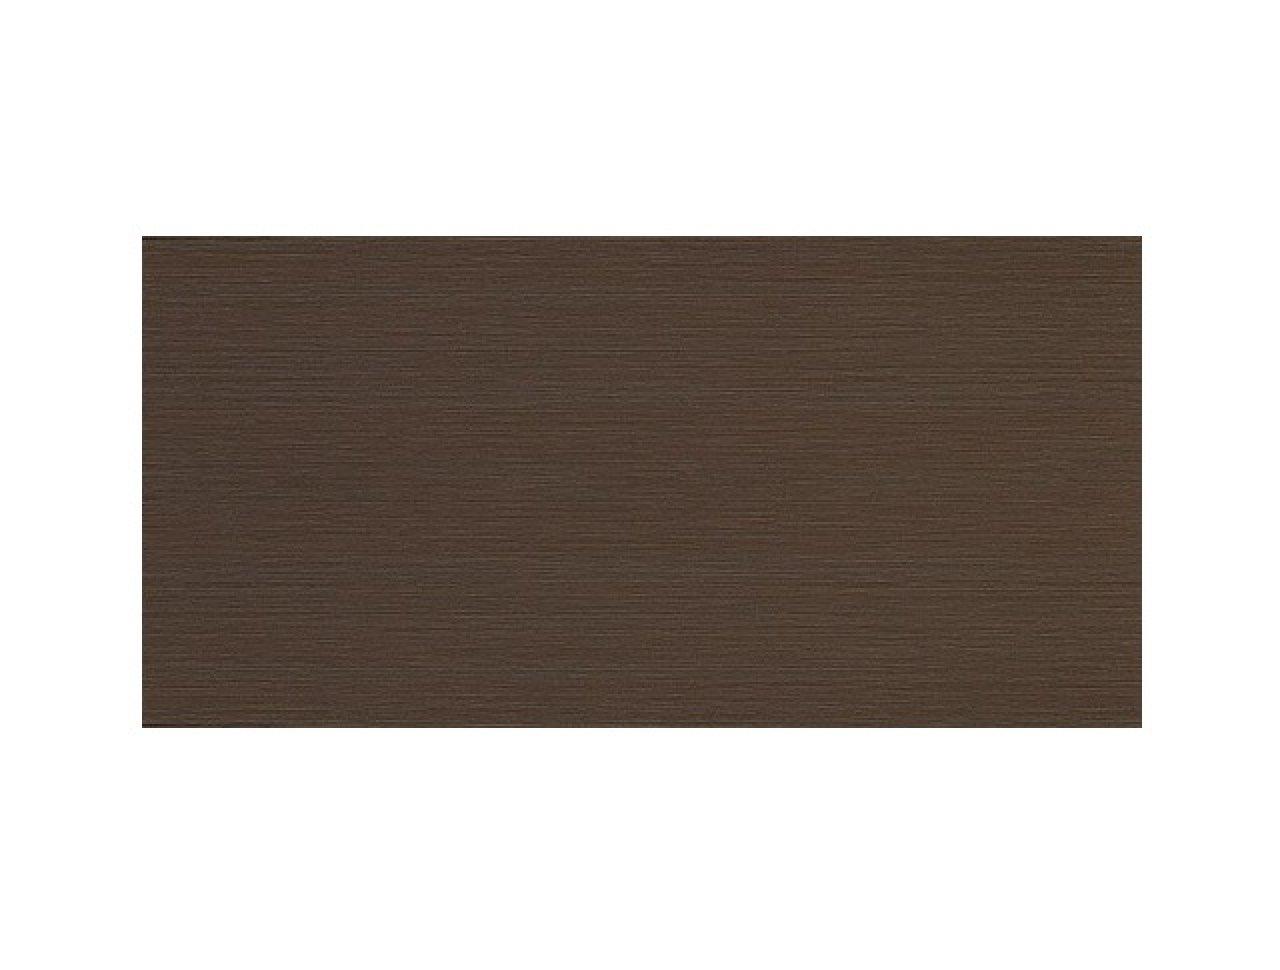 Настенная плитка Brilliant Chocolat 40x80